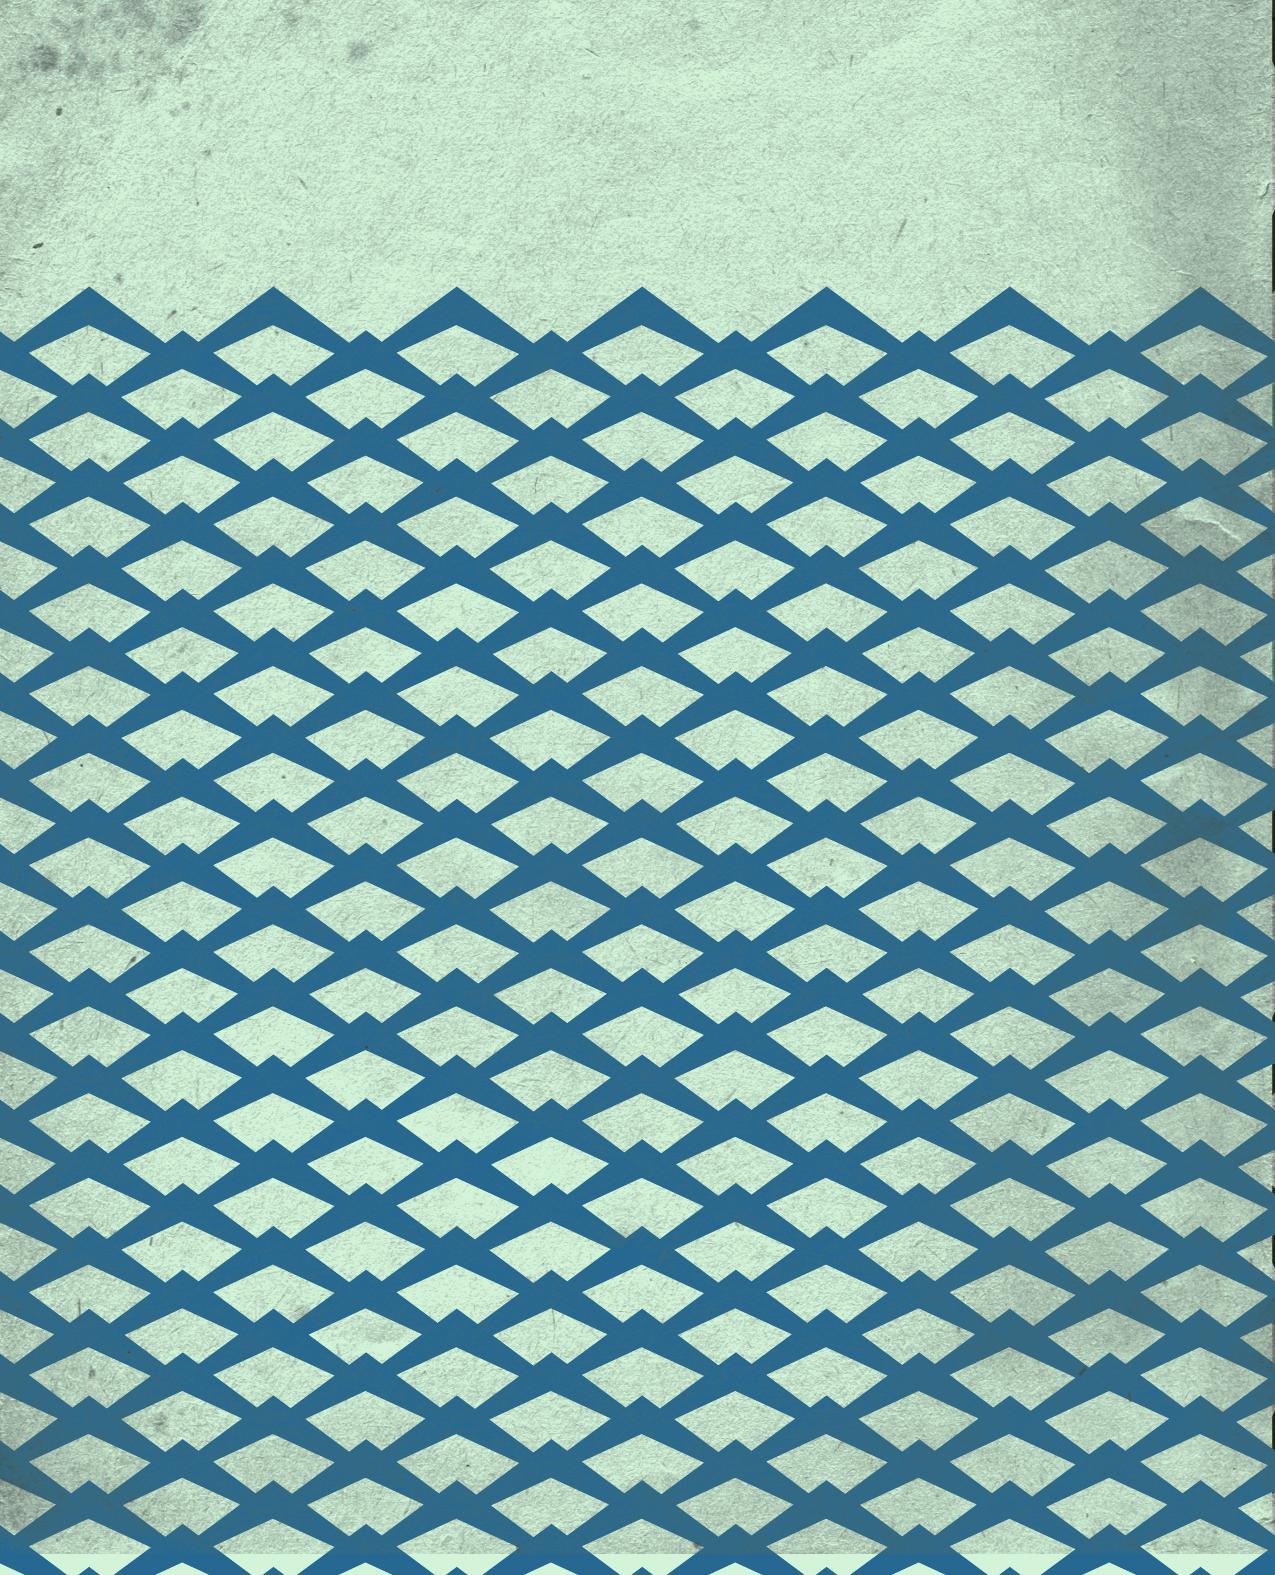 patterns-04.jpg